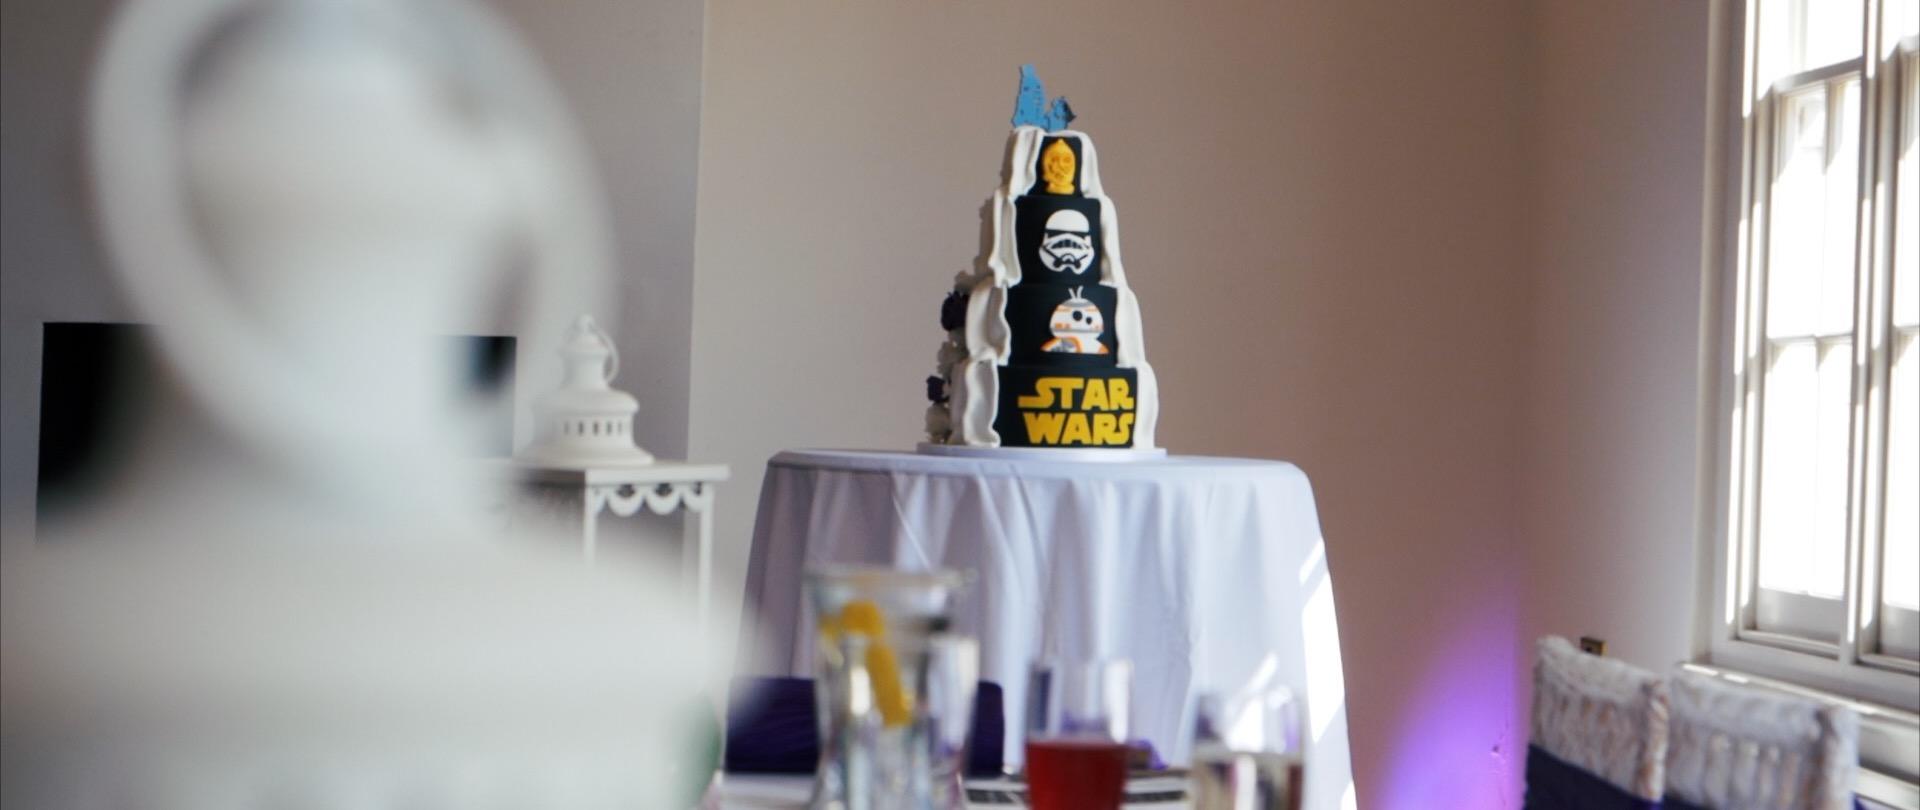 Star Wars Wedding Cake May 4th.jpg